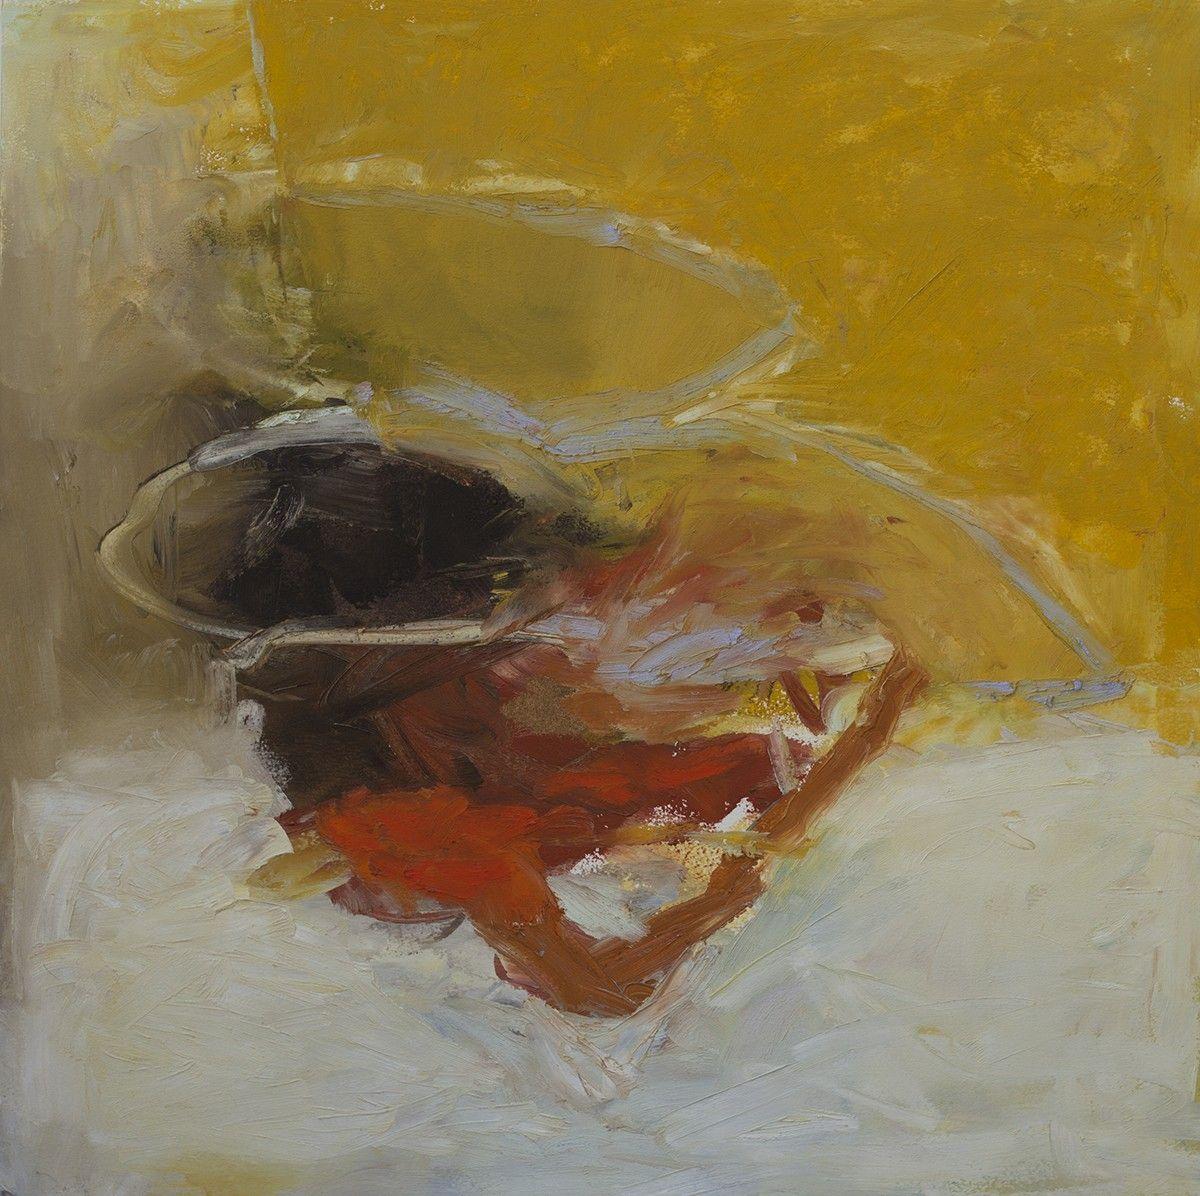 Barbara sternberger at linda hodges gallery in seattle